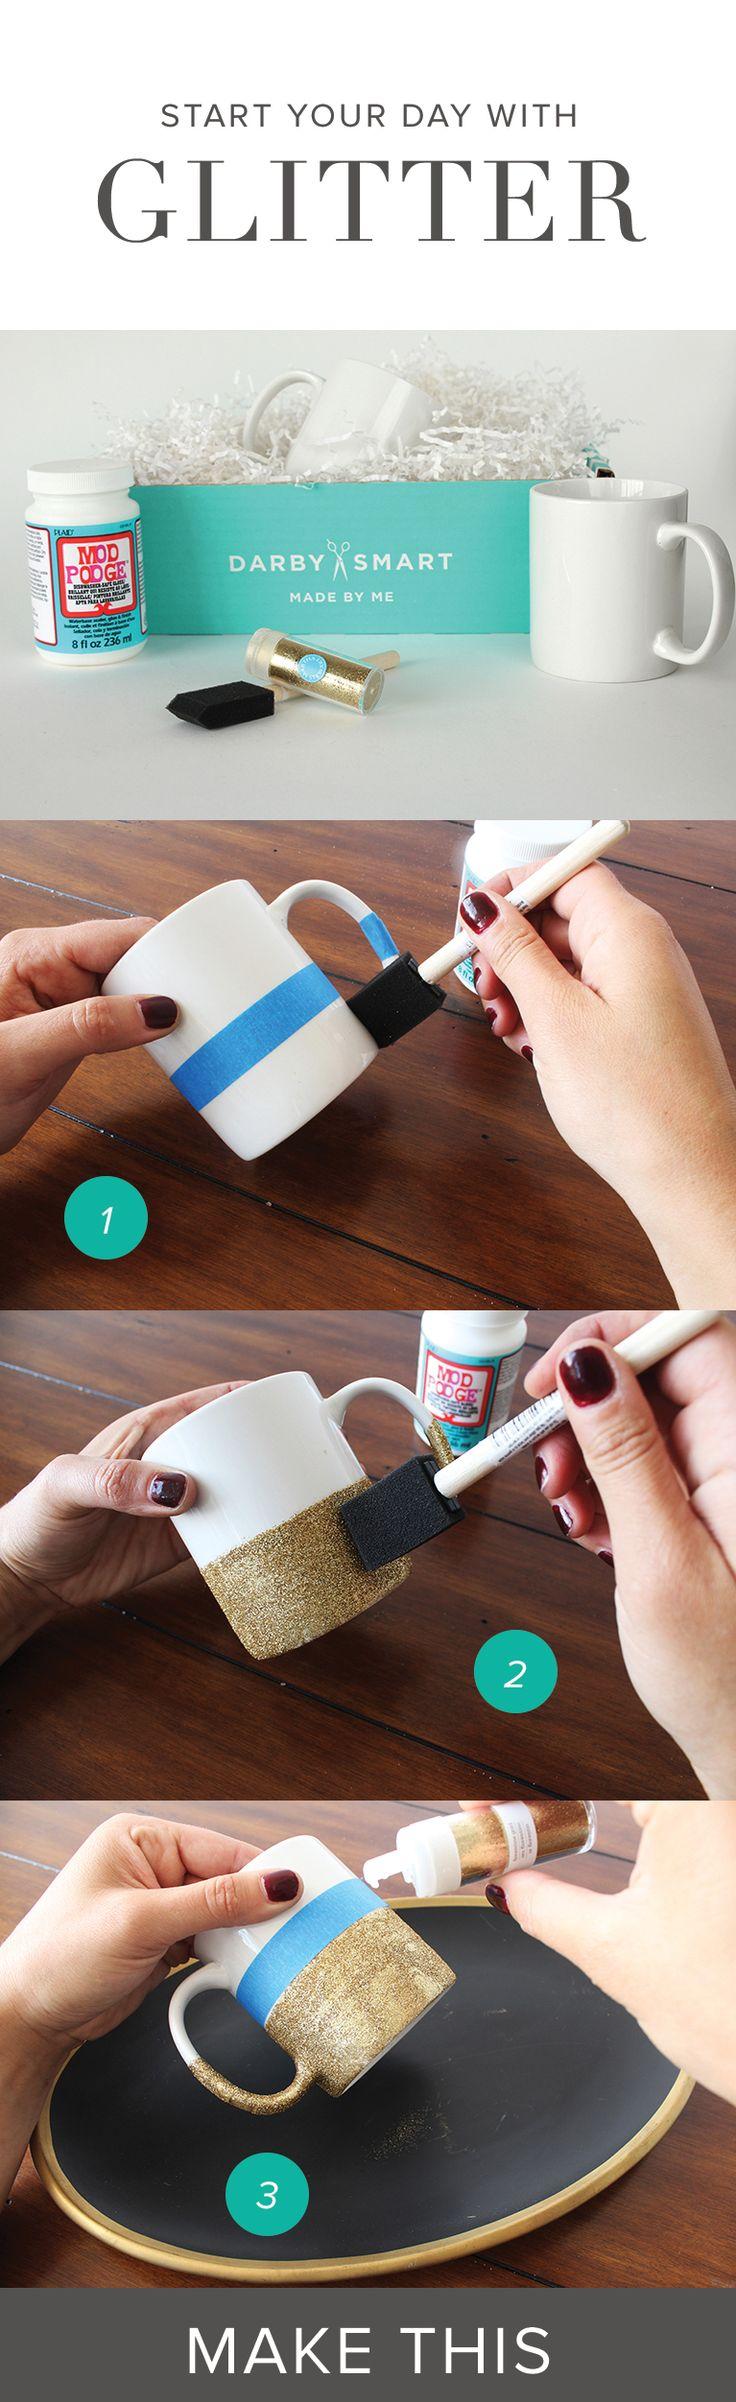 #DIY Glitter Mugs #darbysmart